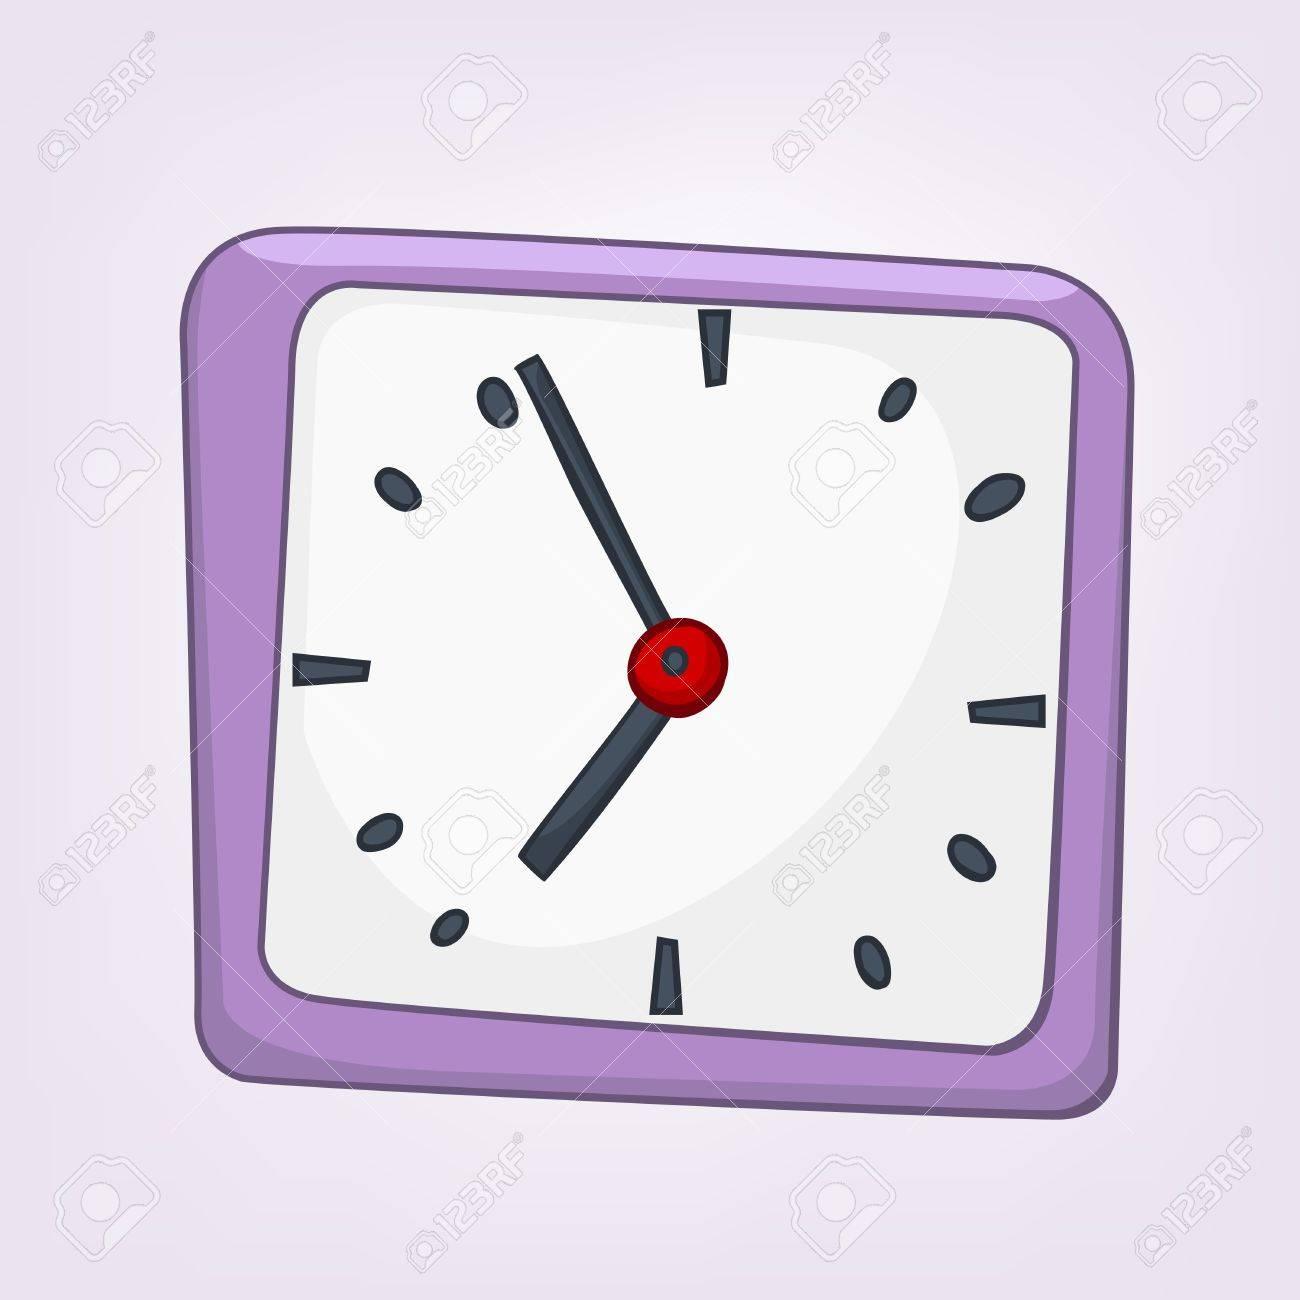 Cartoon Home Clock Stock Vector - 12491734